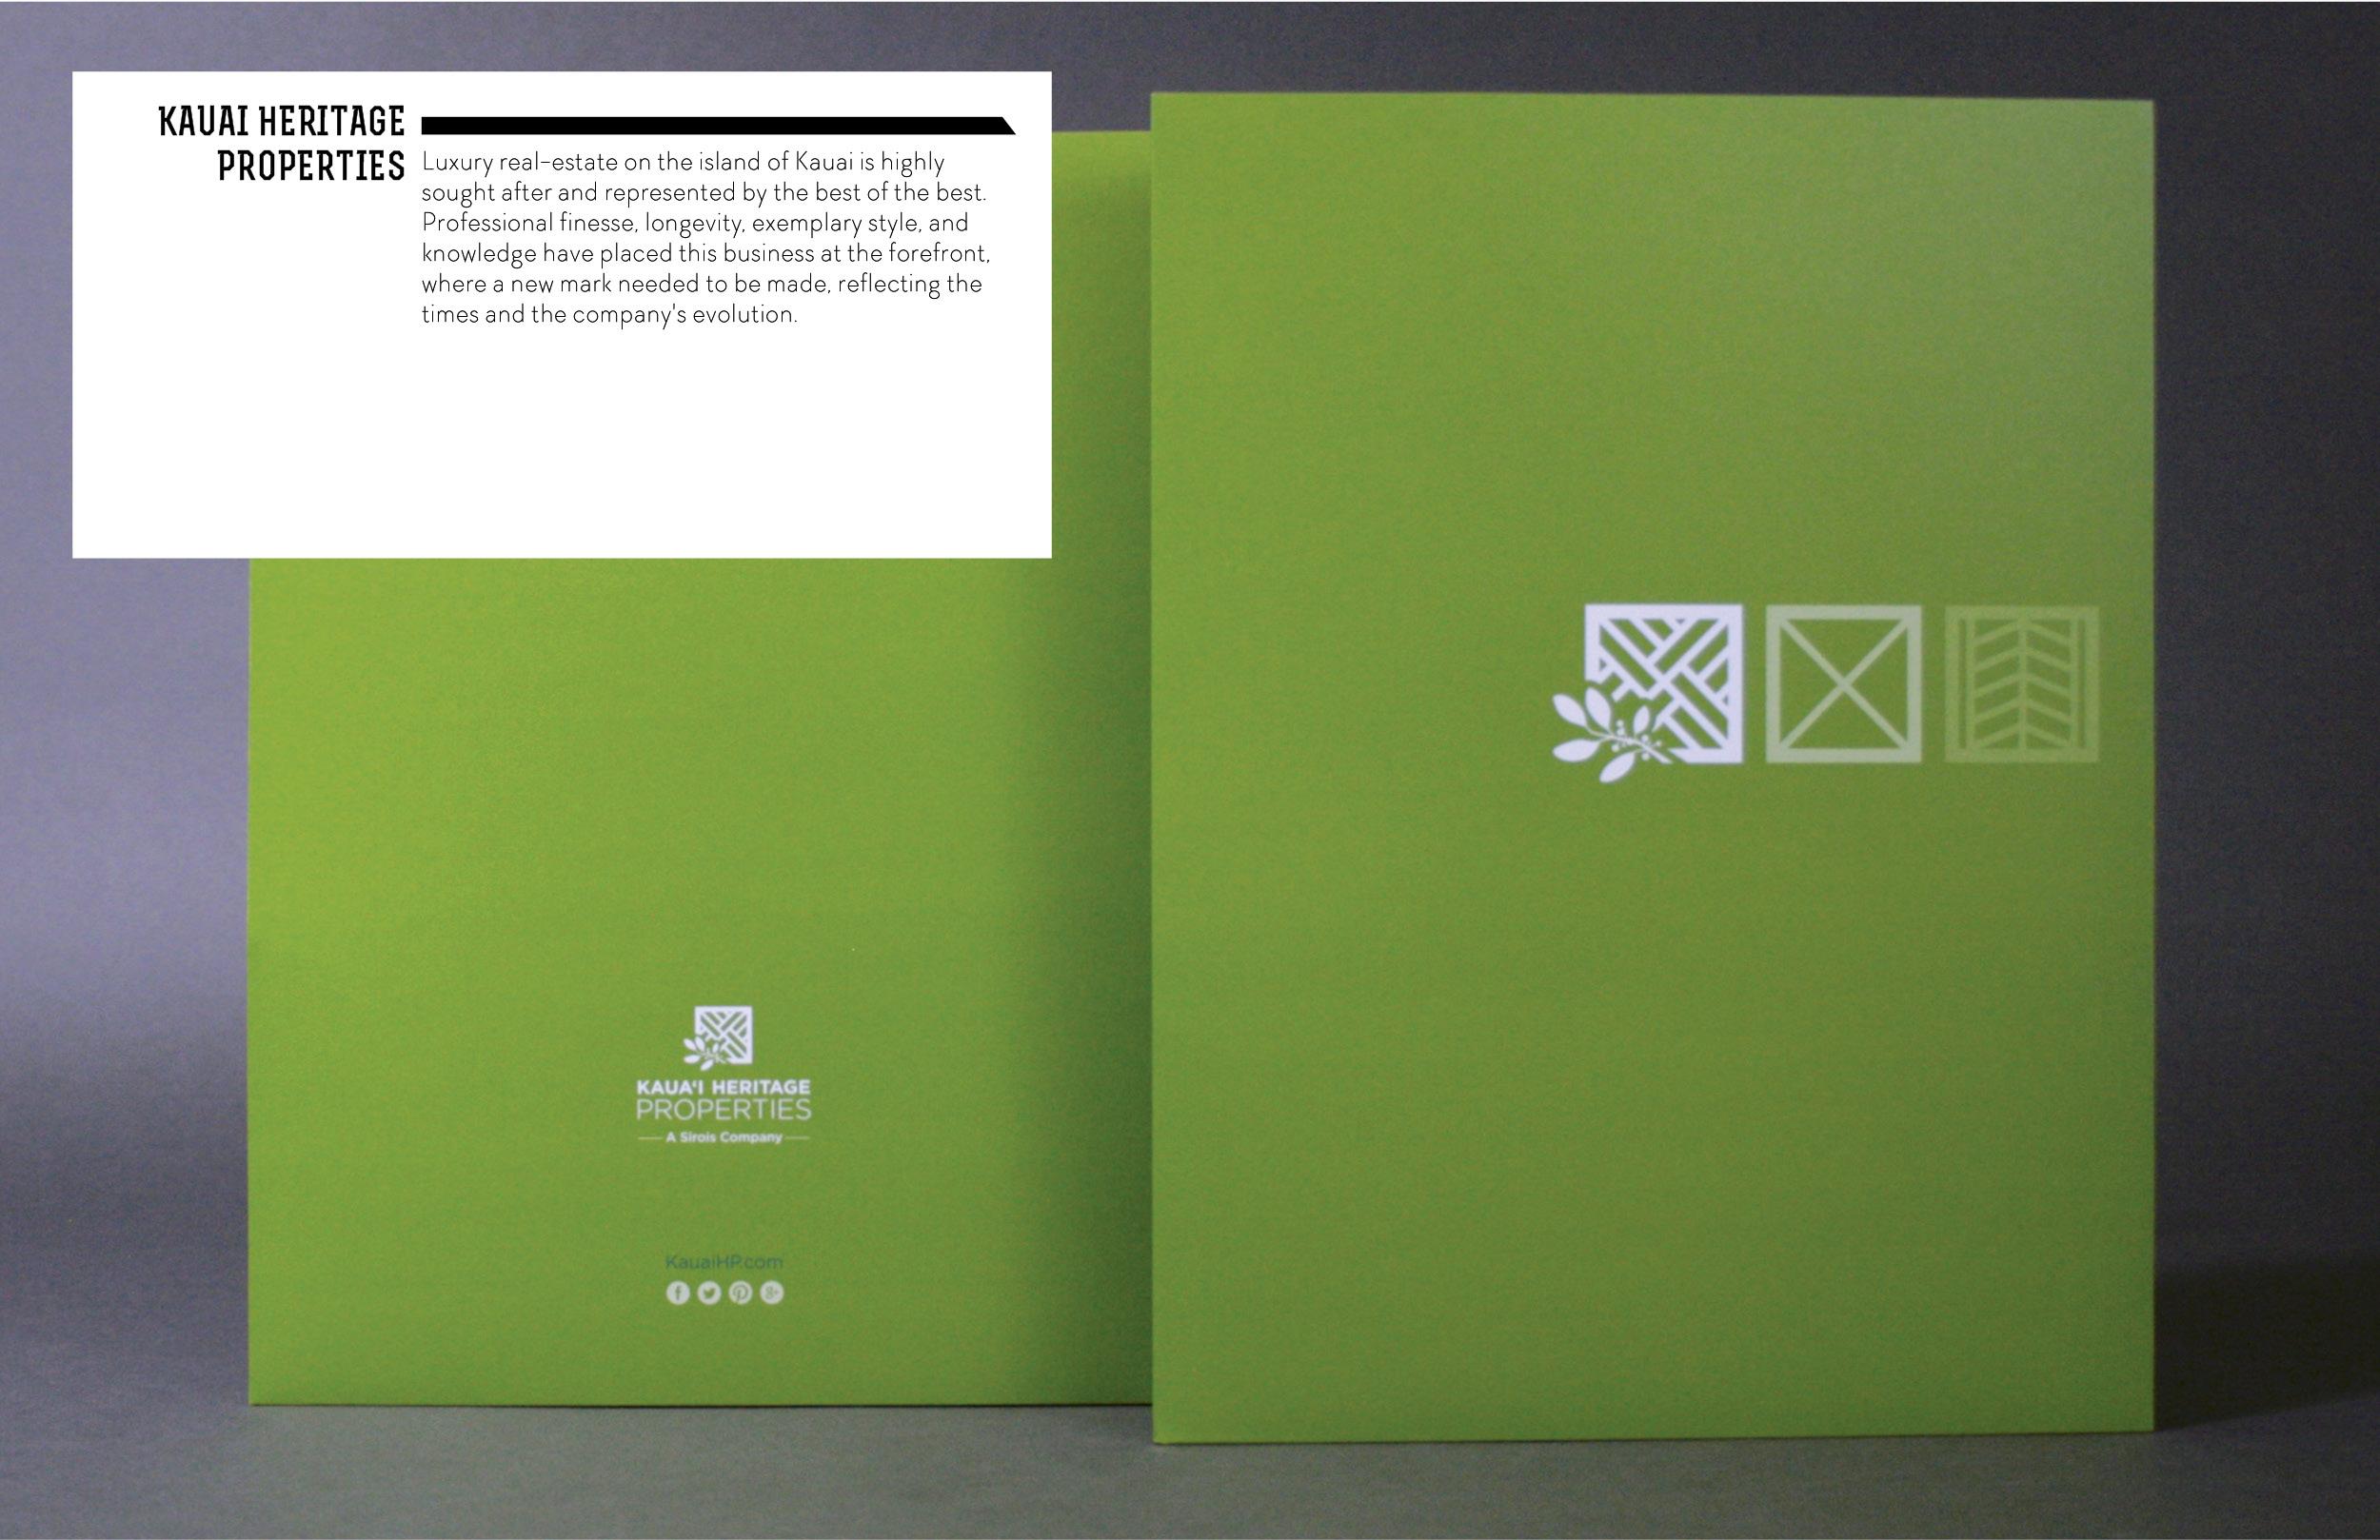 Work kelly s lemar deliverables logo id set nbsp nbsp nbsp letterhead envelope business reheart Image collections